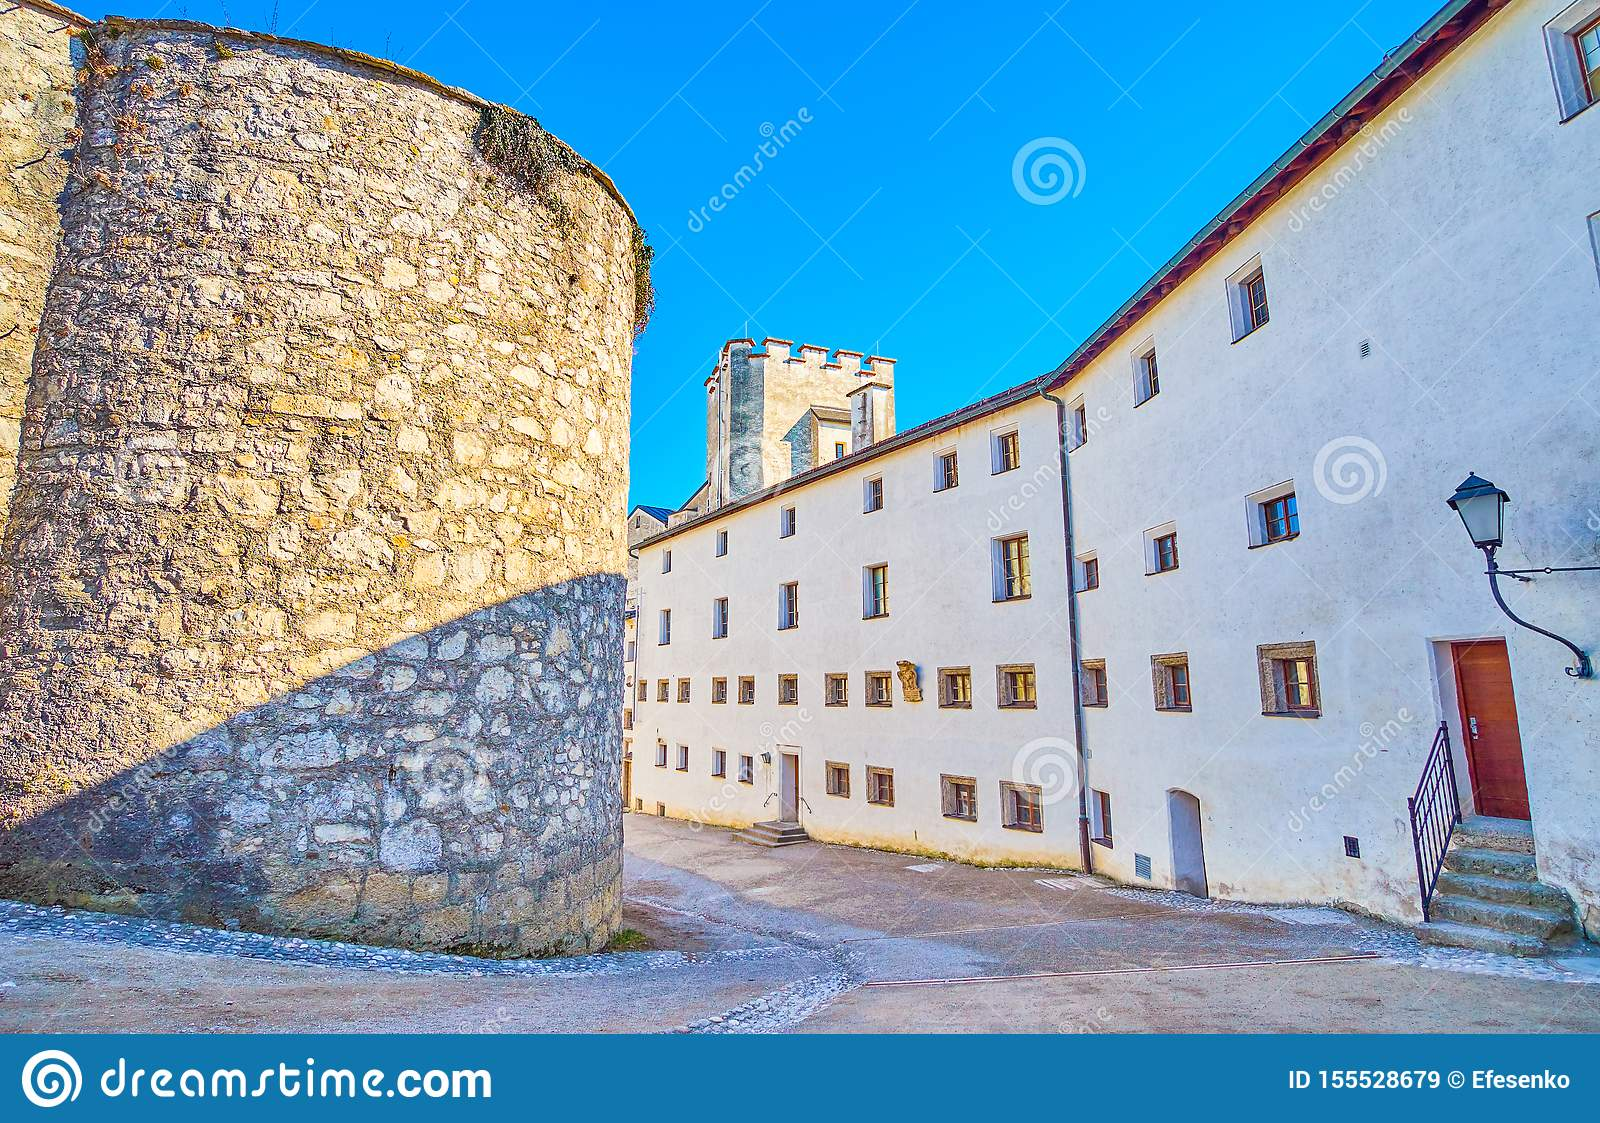 The medieval buildings of Hohensalzburg Citadel, Salzburg, Austria